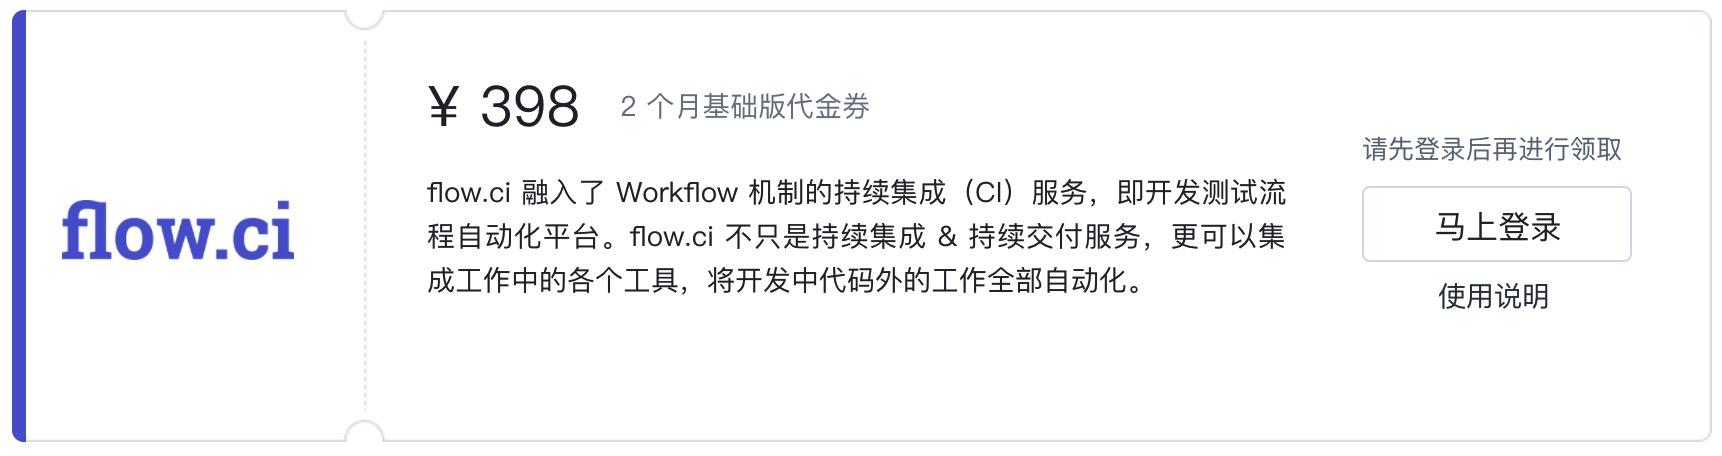 flow.ci